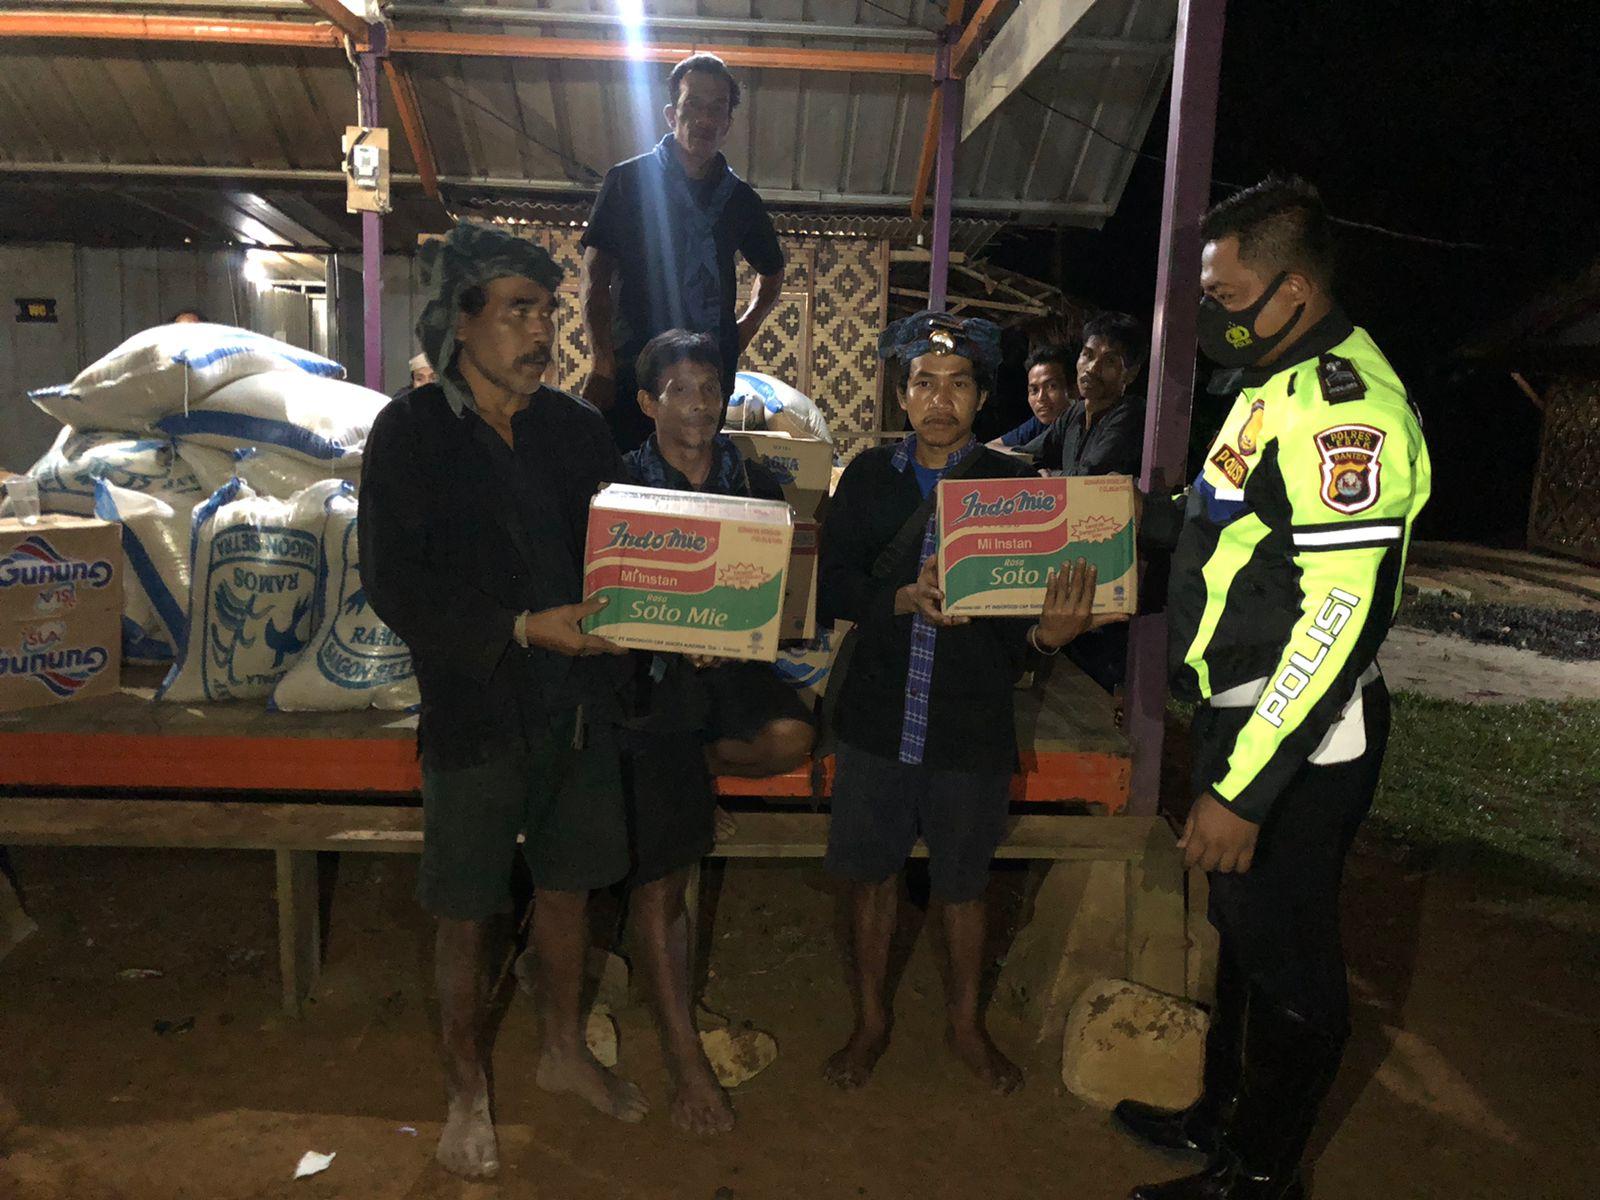 Pasca Kebakaran Polres Lebak Polda Banten memberikan bantuan sembako kepada korban kebakaran di Kampung Cepak Huni Desa Kanekes,